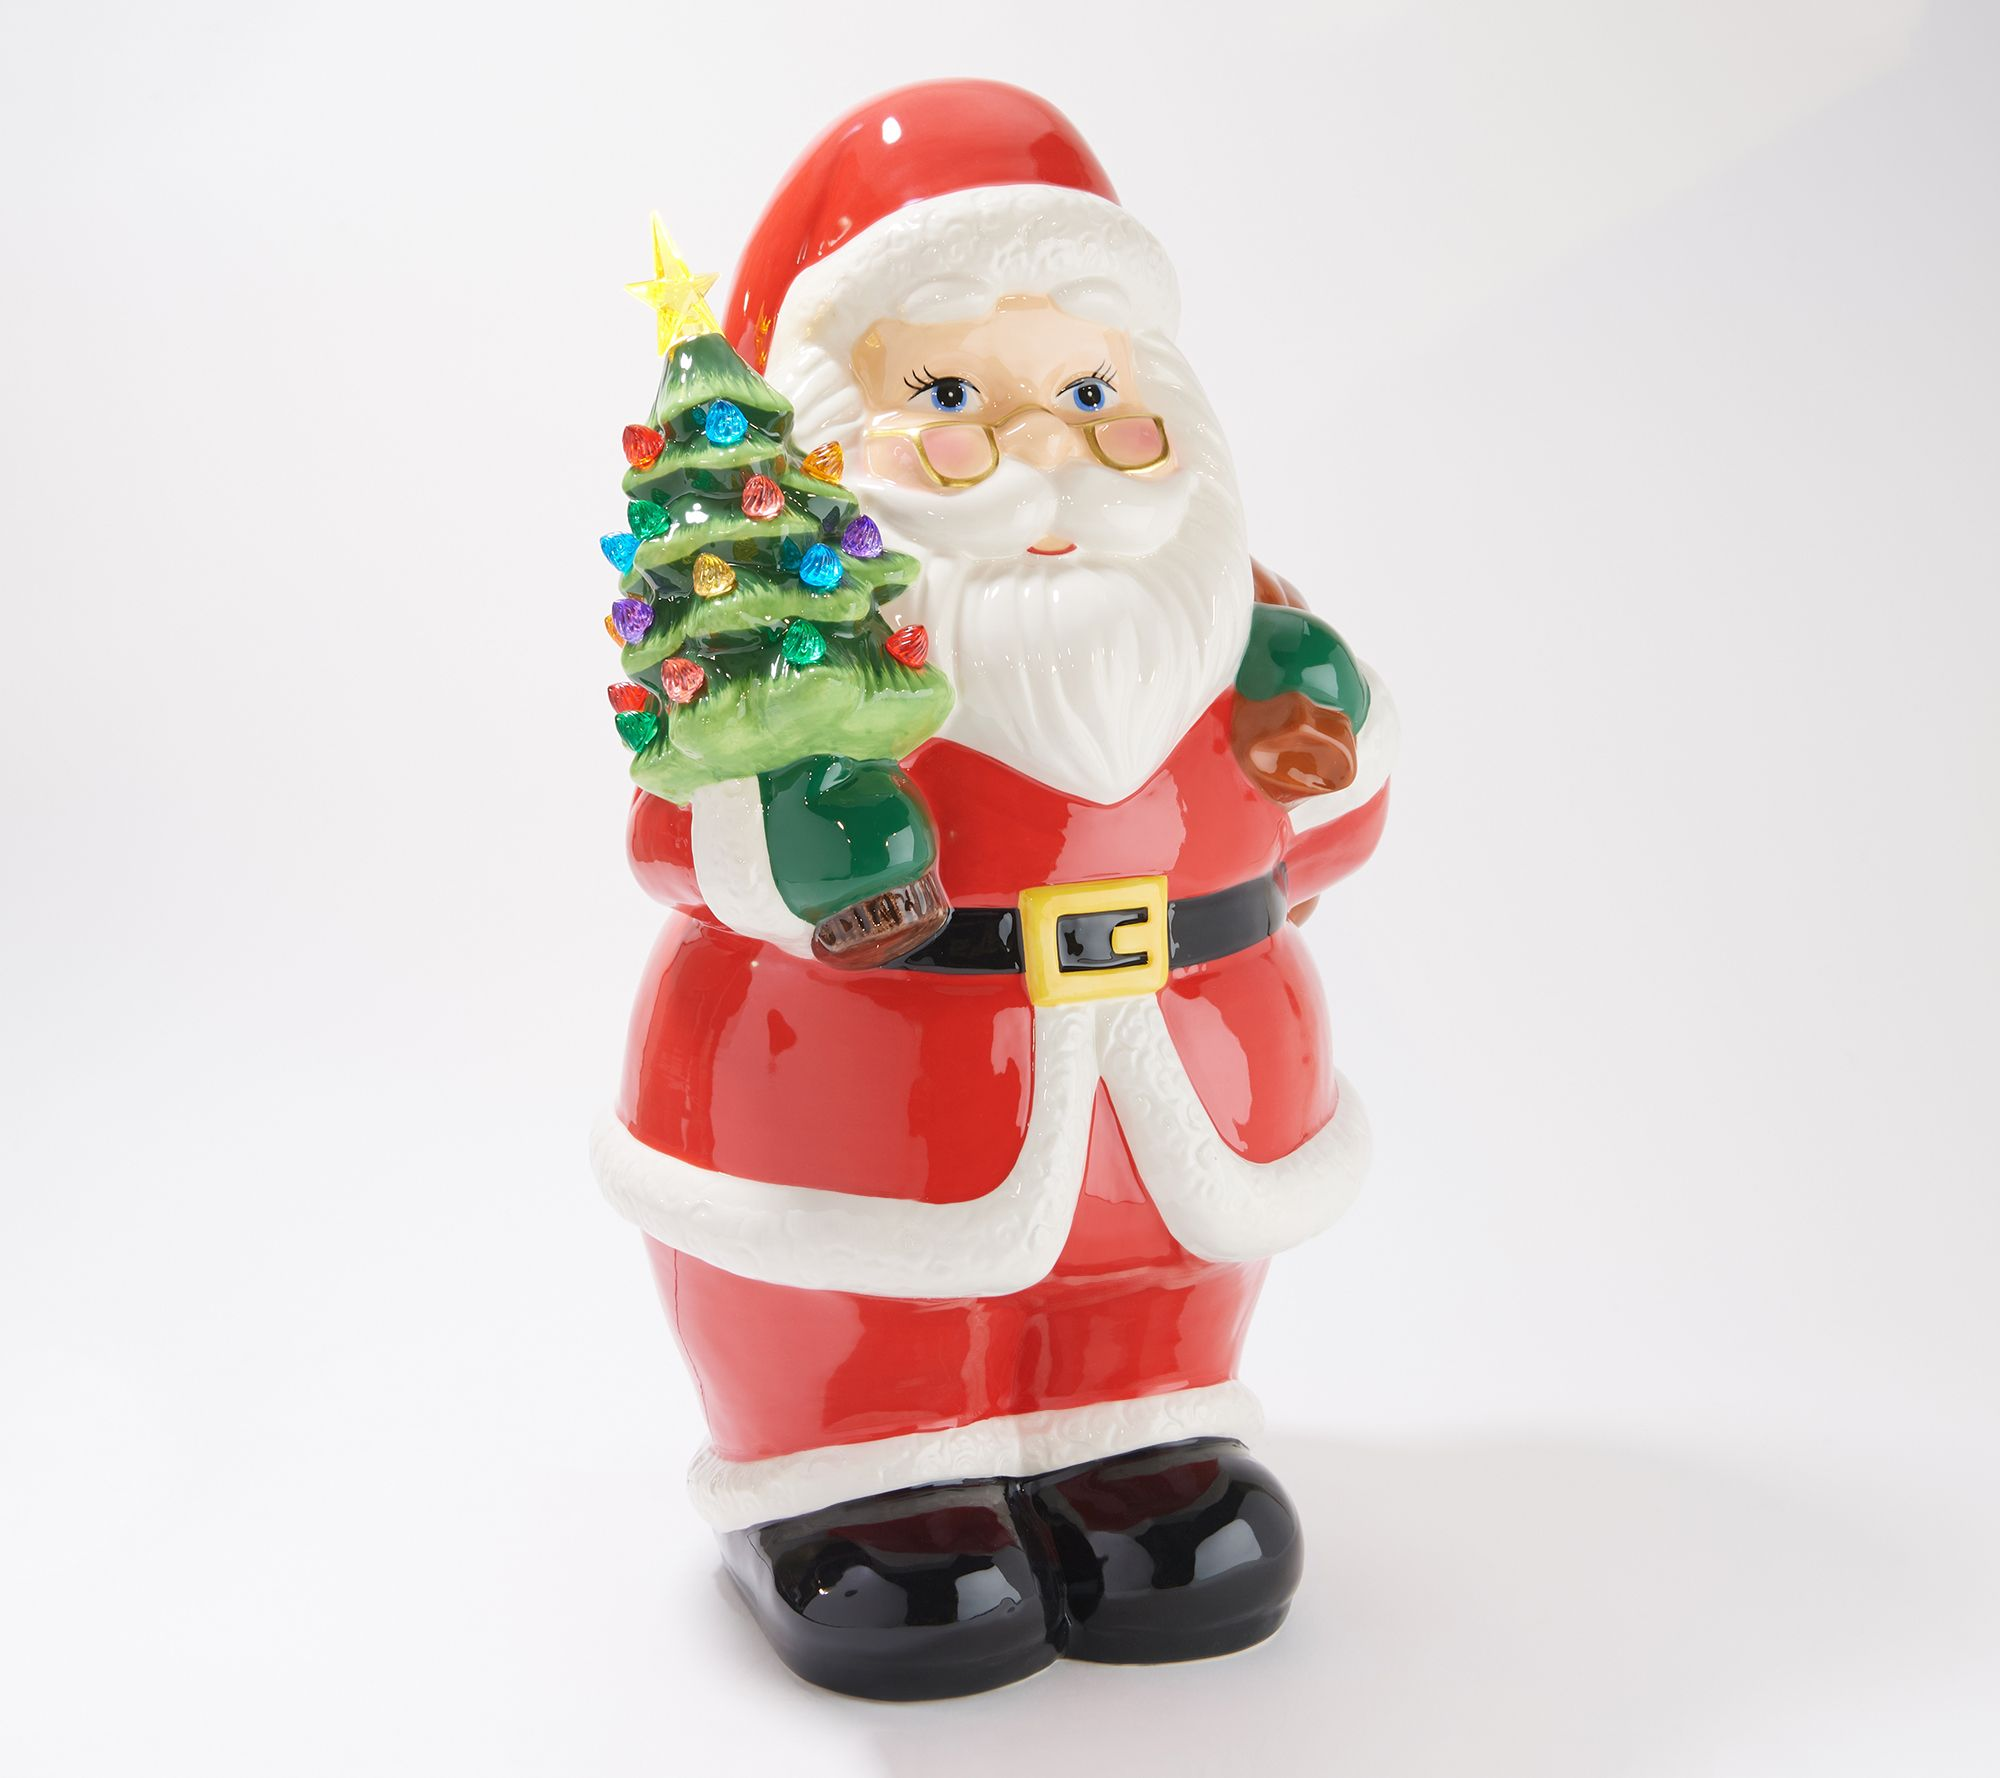 Mr Christmas Oversized Ceramic Nostalgic Holiday Figure Qvc Com